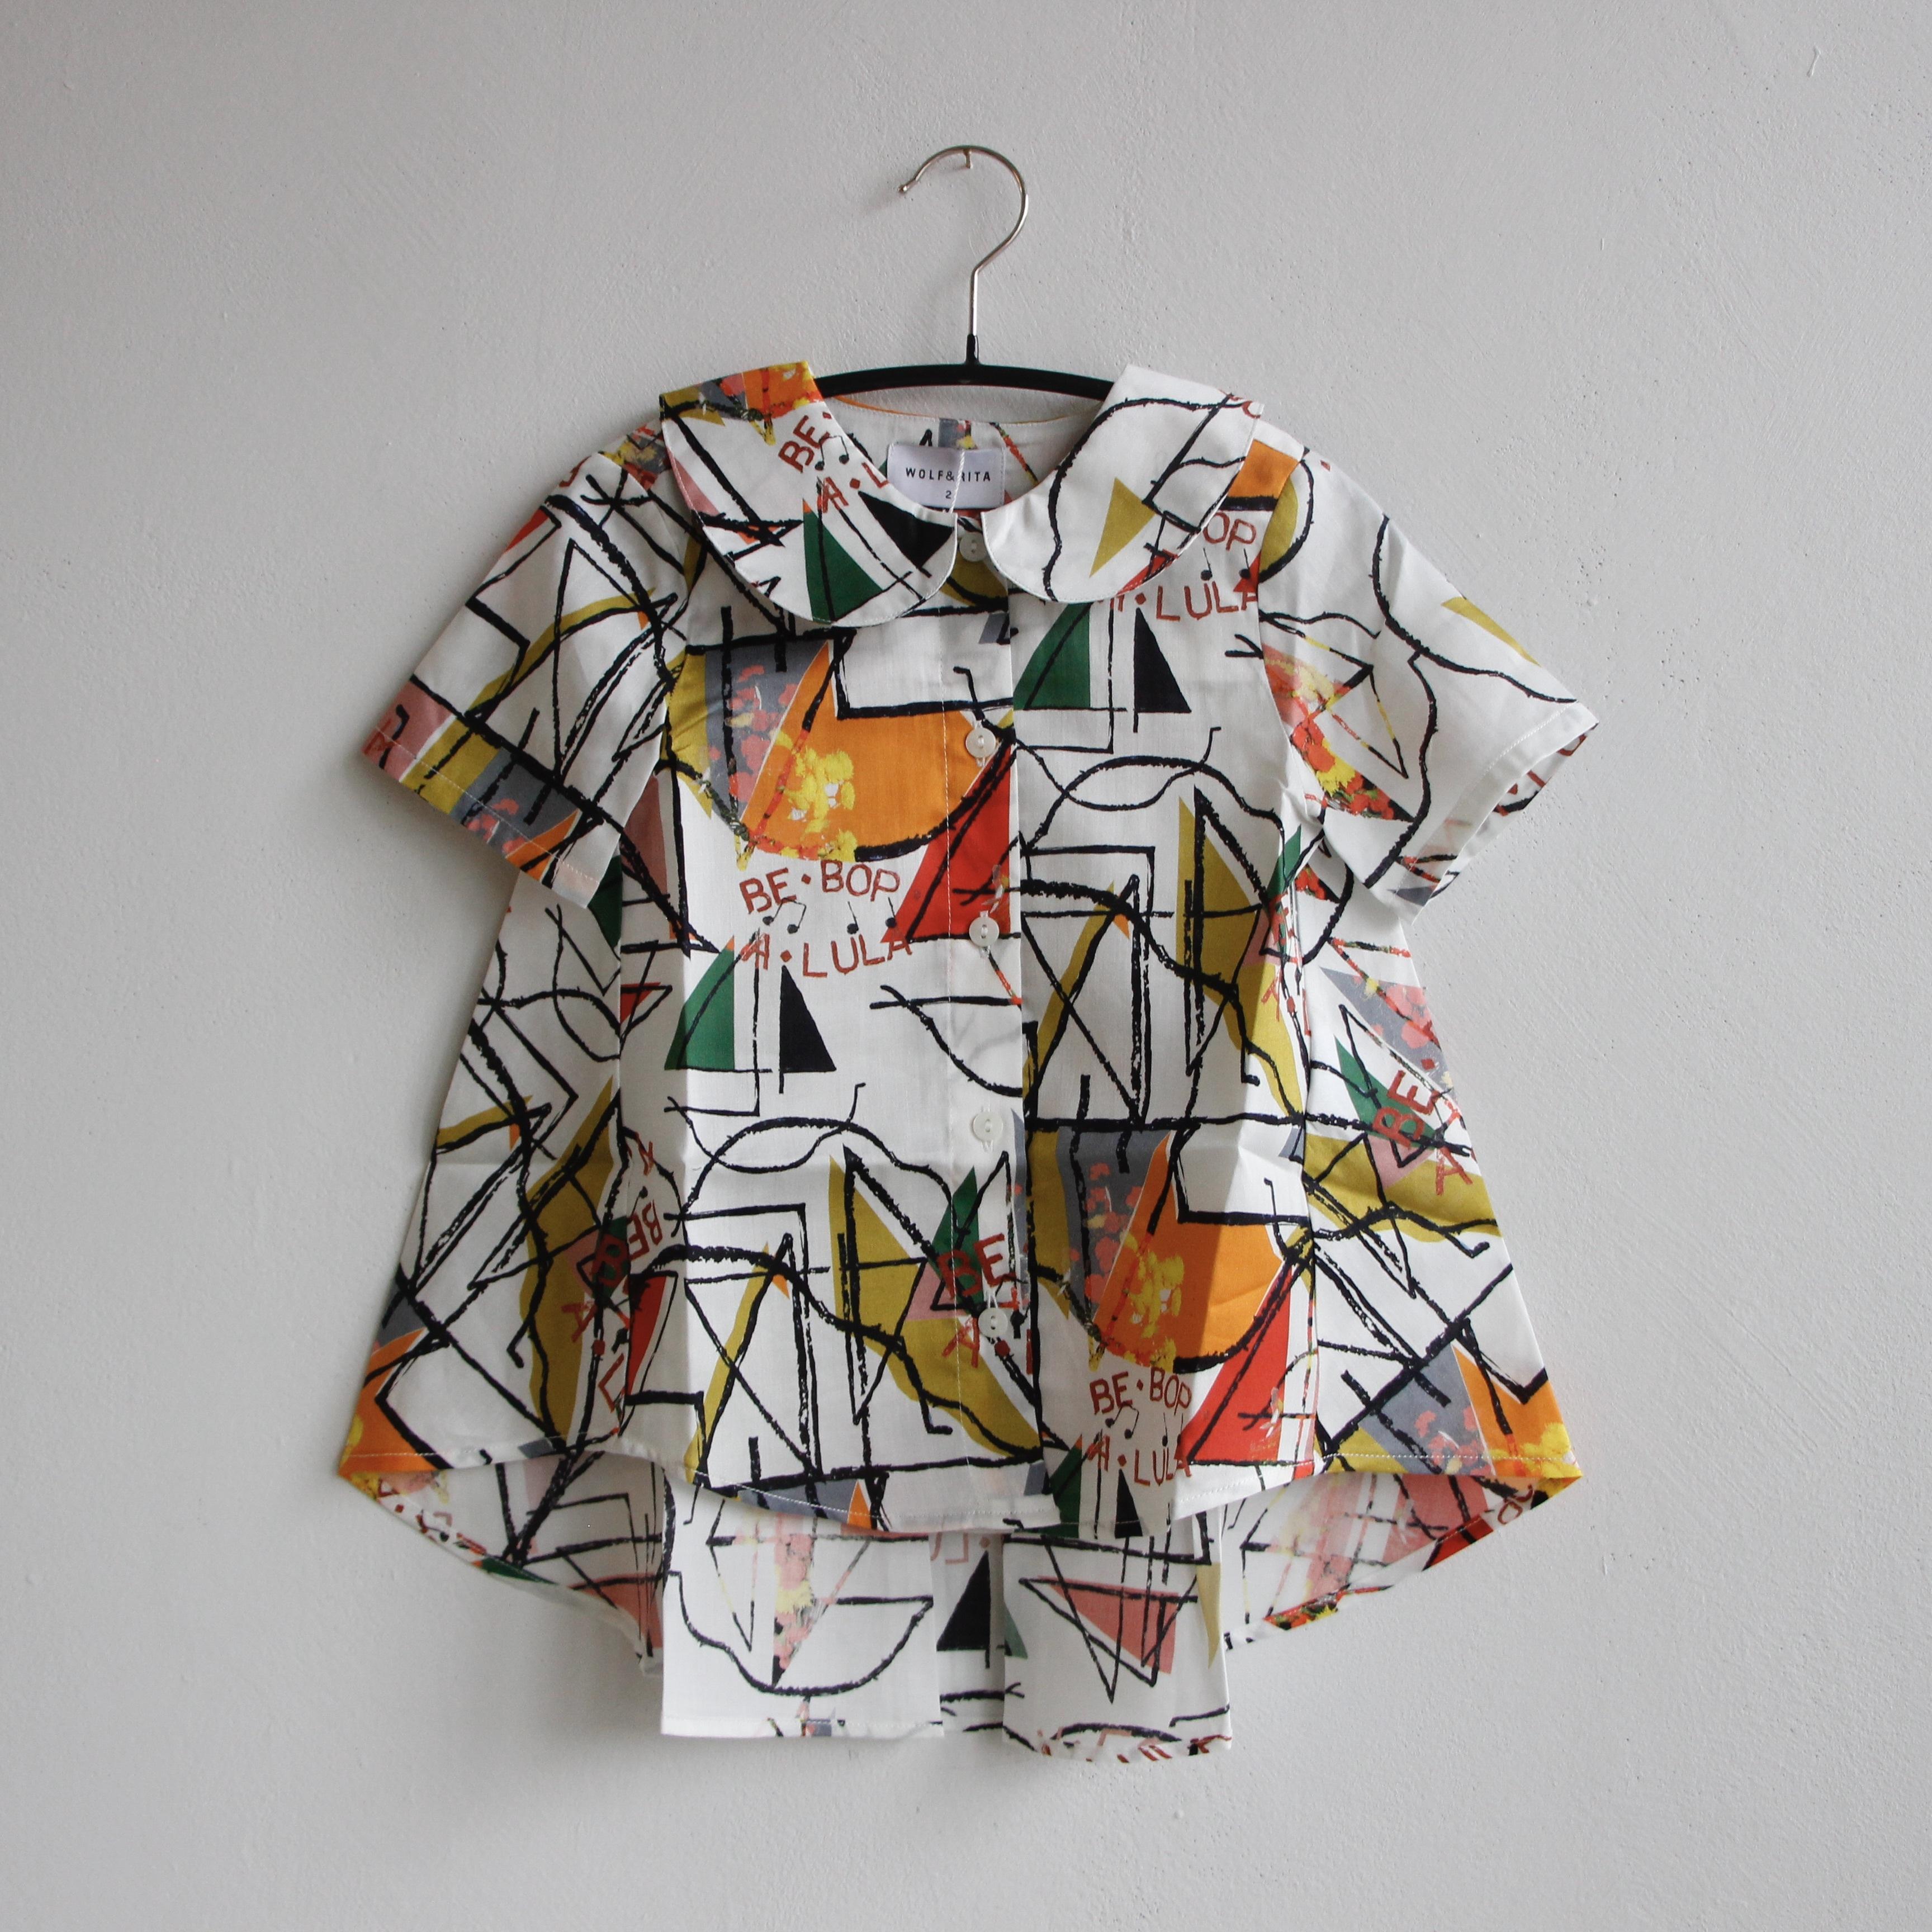 《WOLF & RITA 2021SS》DIANA blouse / BE BOP